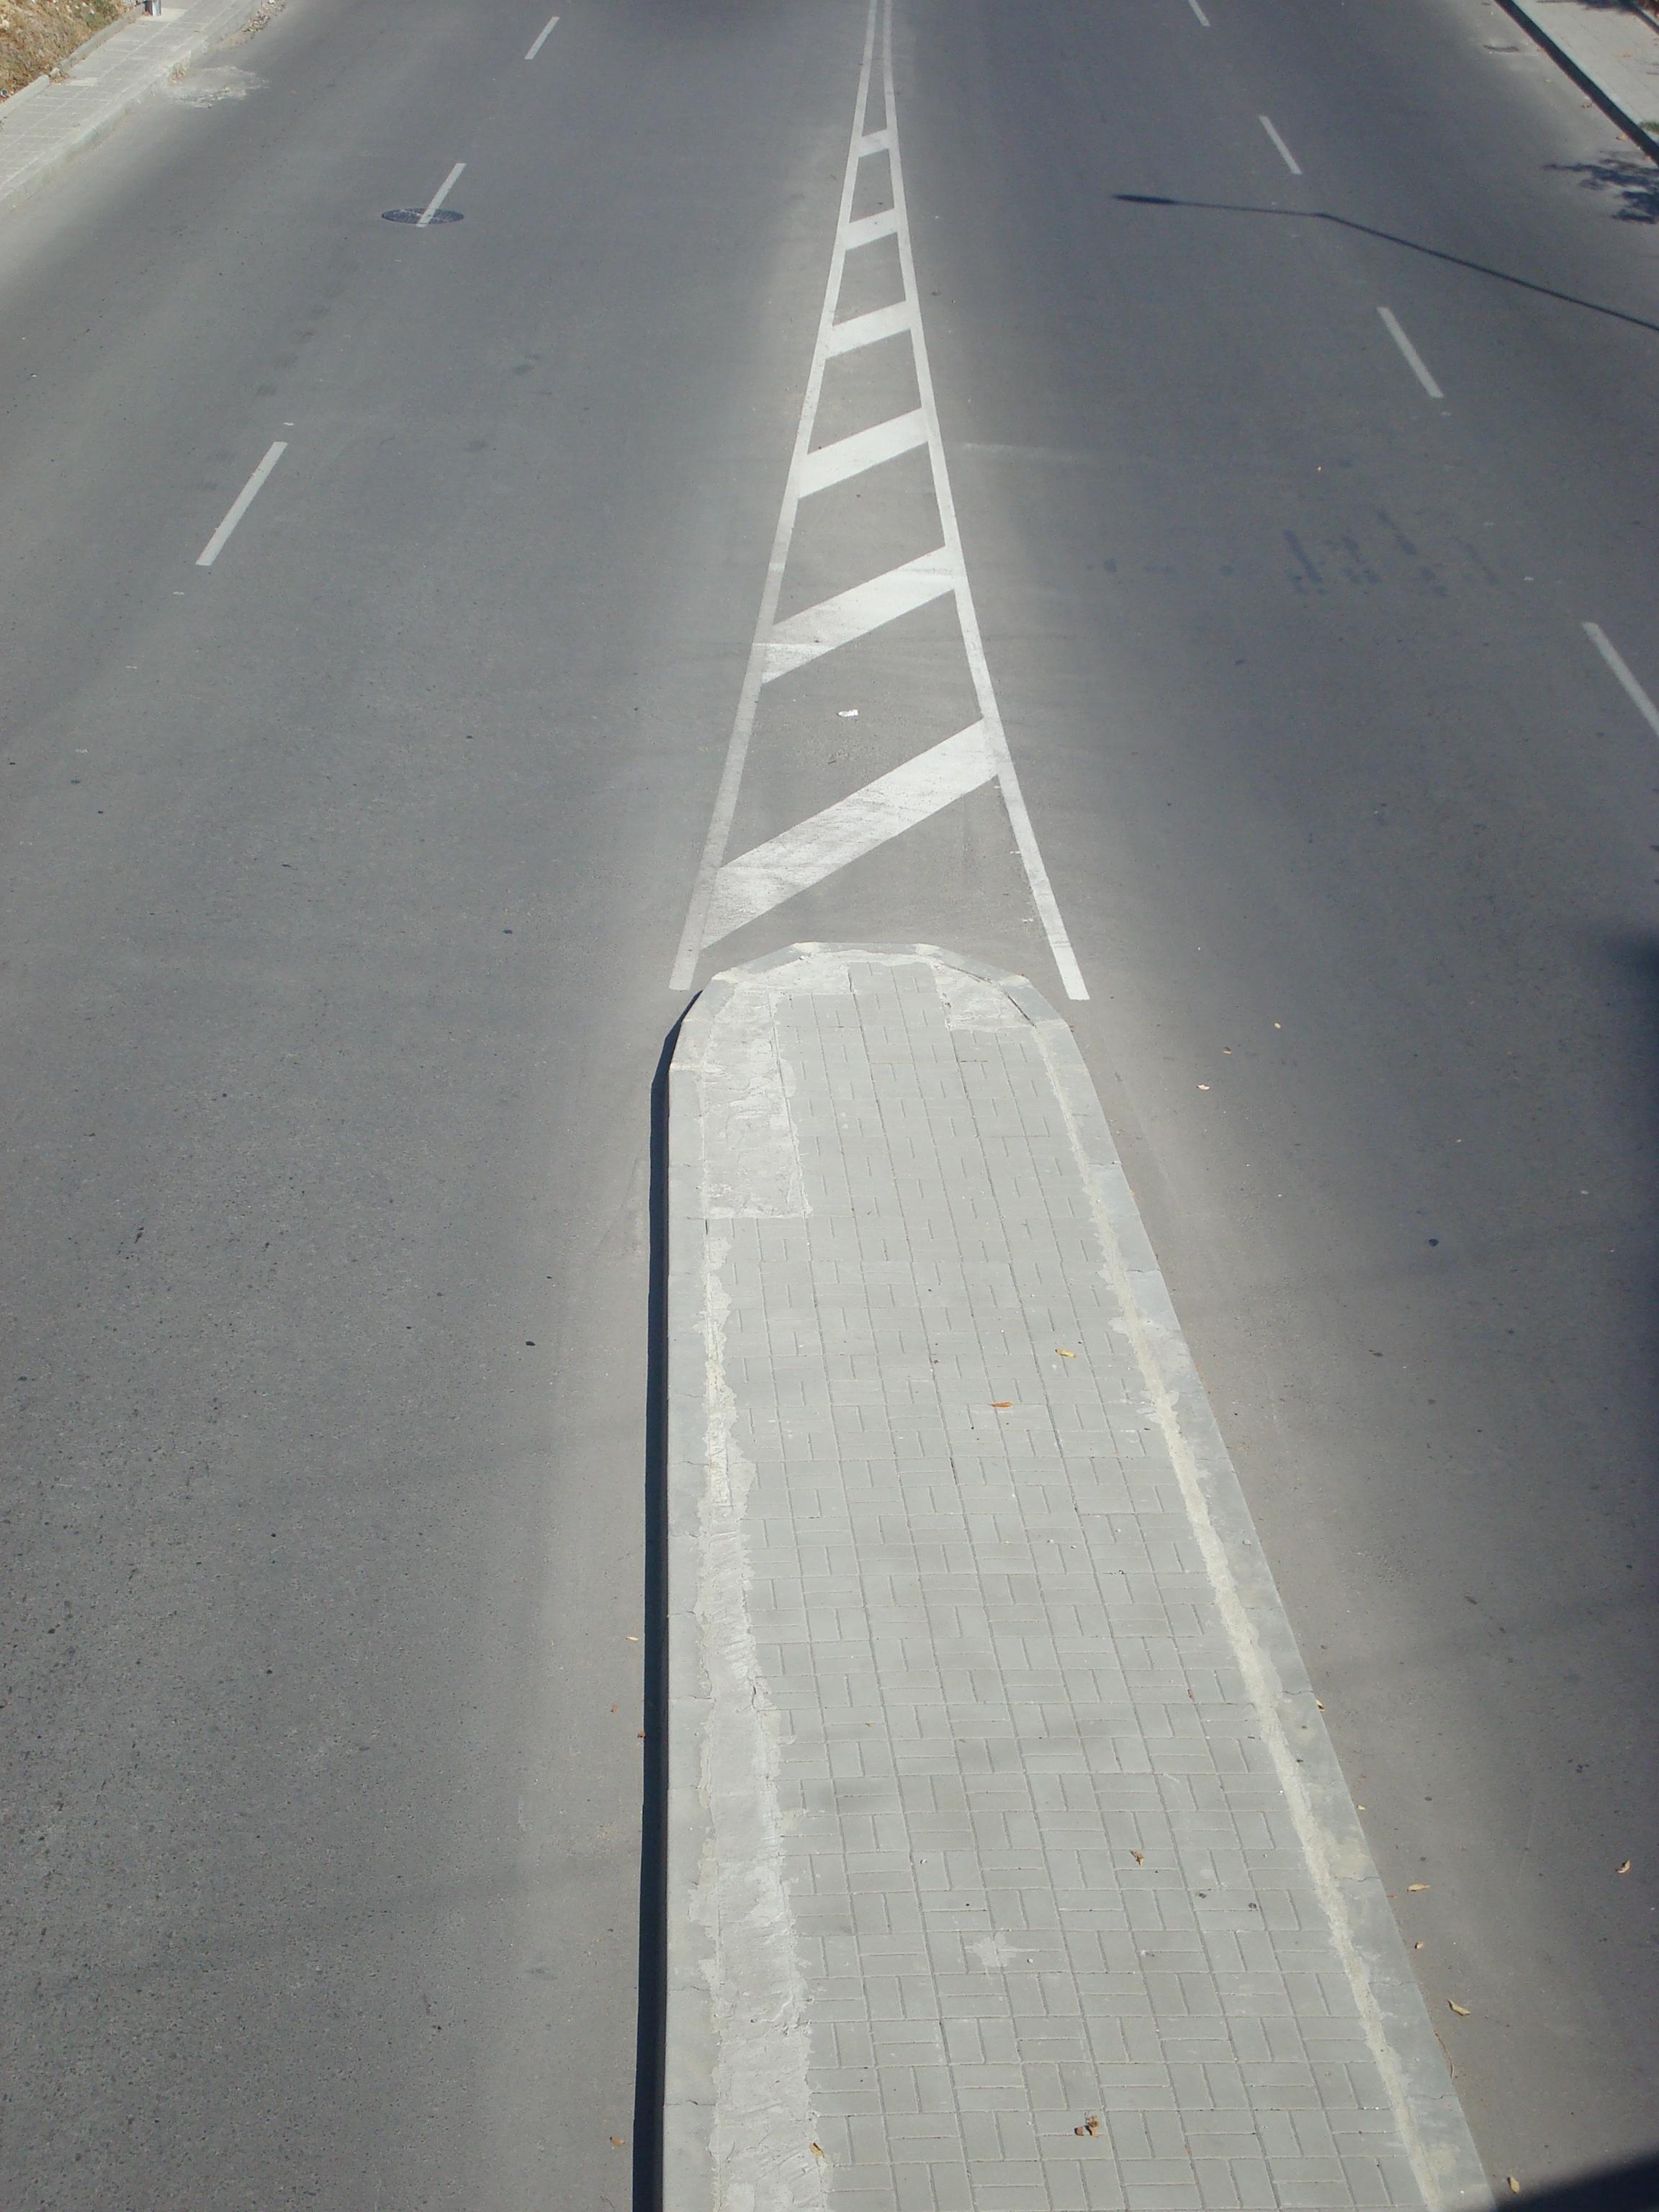 Asphalt road, Asphalt, Black, City, Movement, HQ Photo